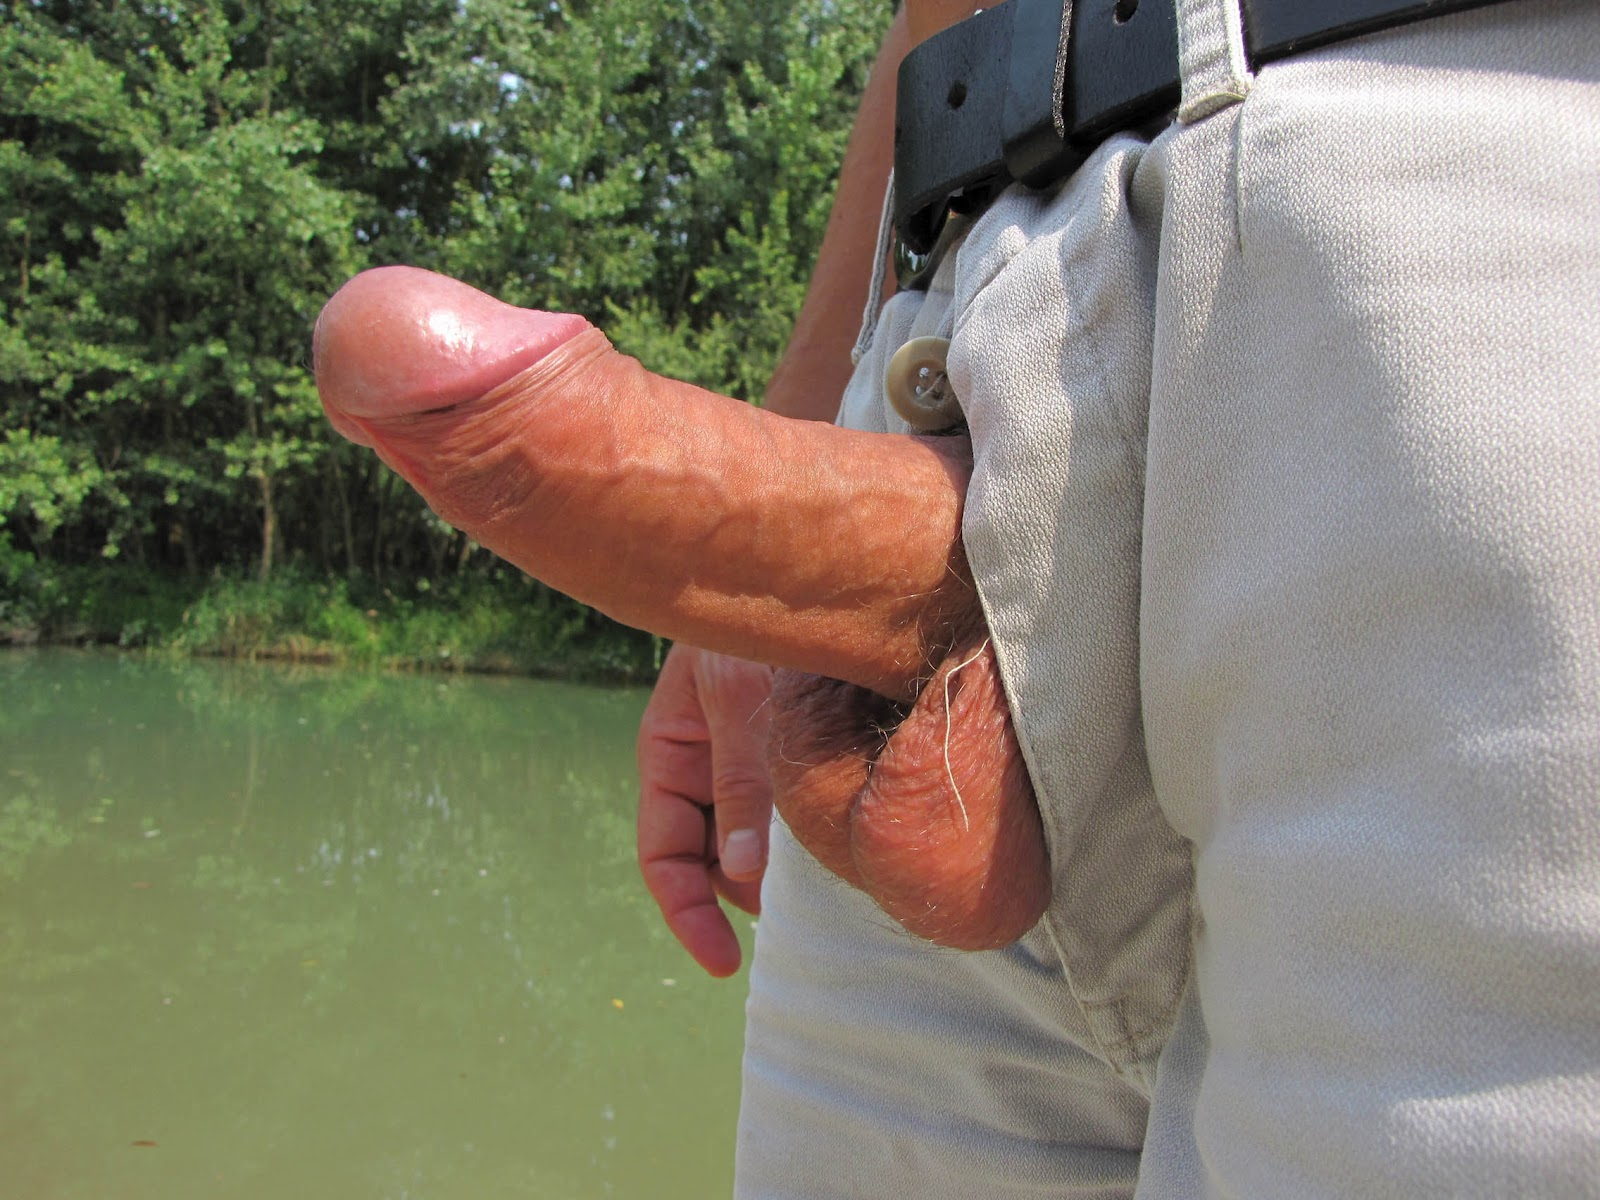 8 inch girth cock